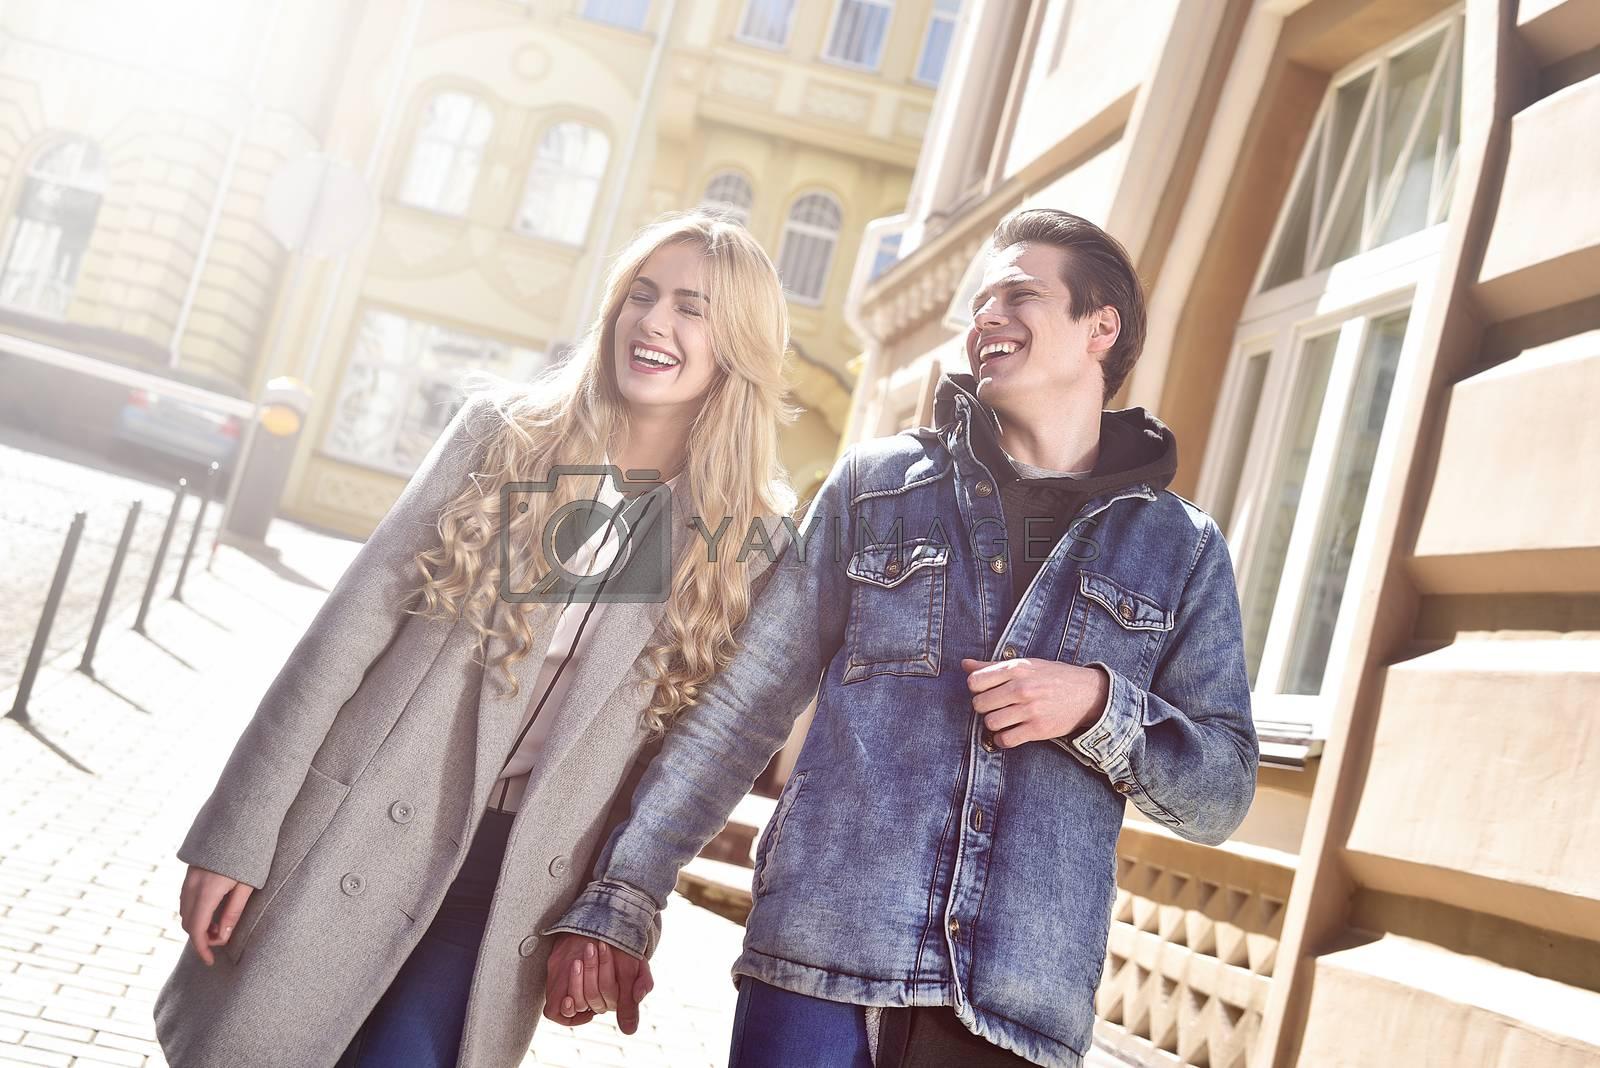 Young laughing couple enjoying sunny mood and having fun